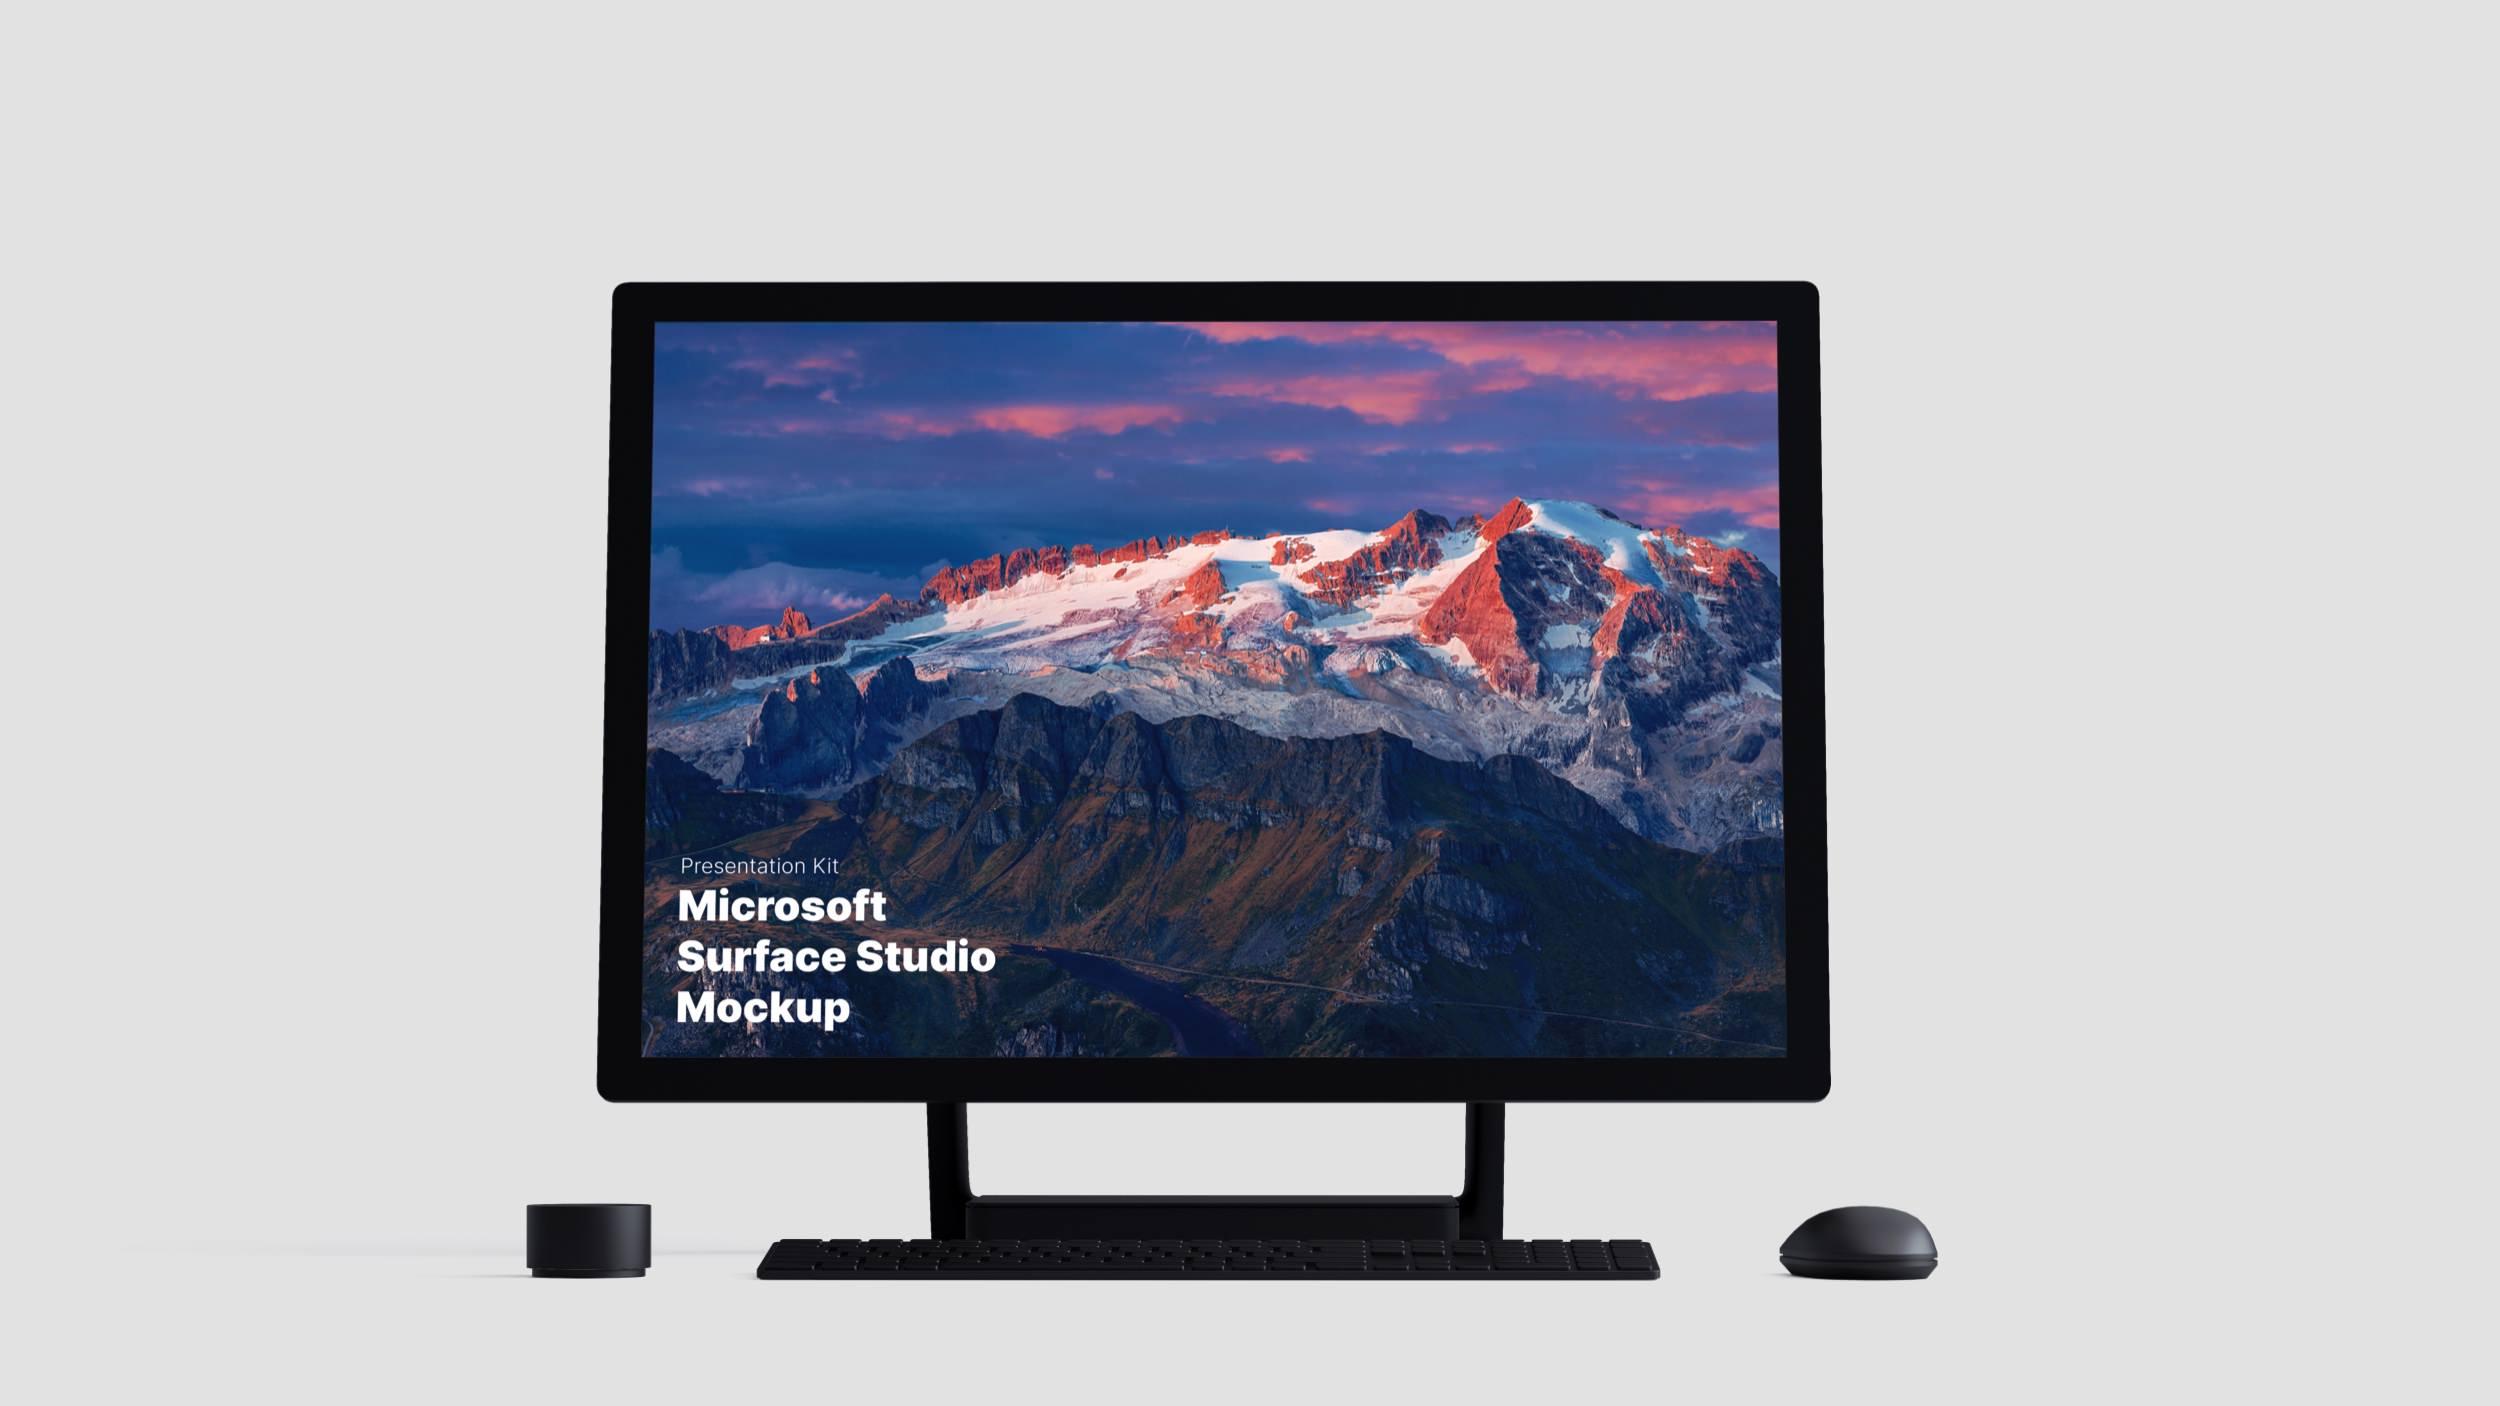 Surface Studio Mockups for Sketch, Photoshop, Figma